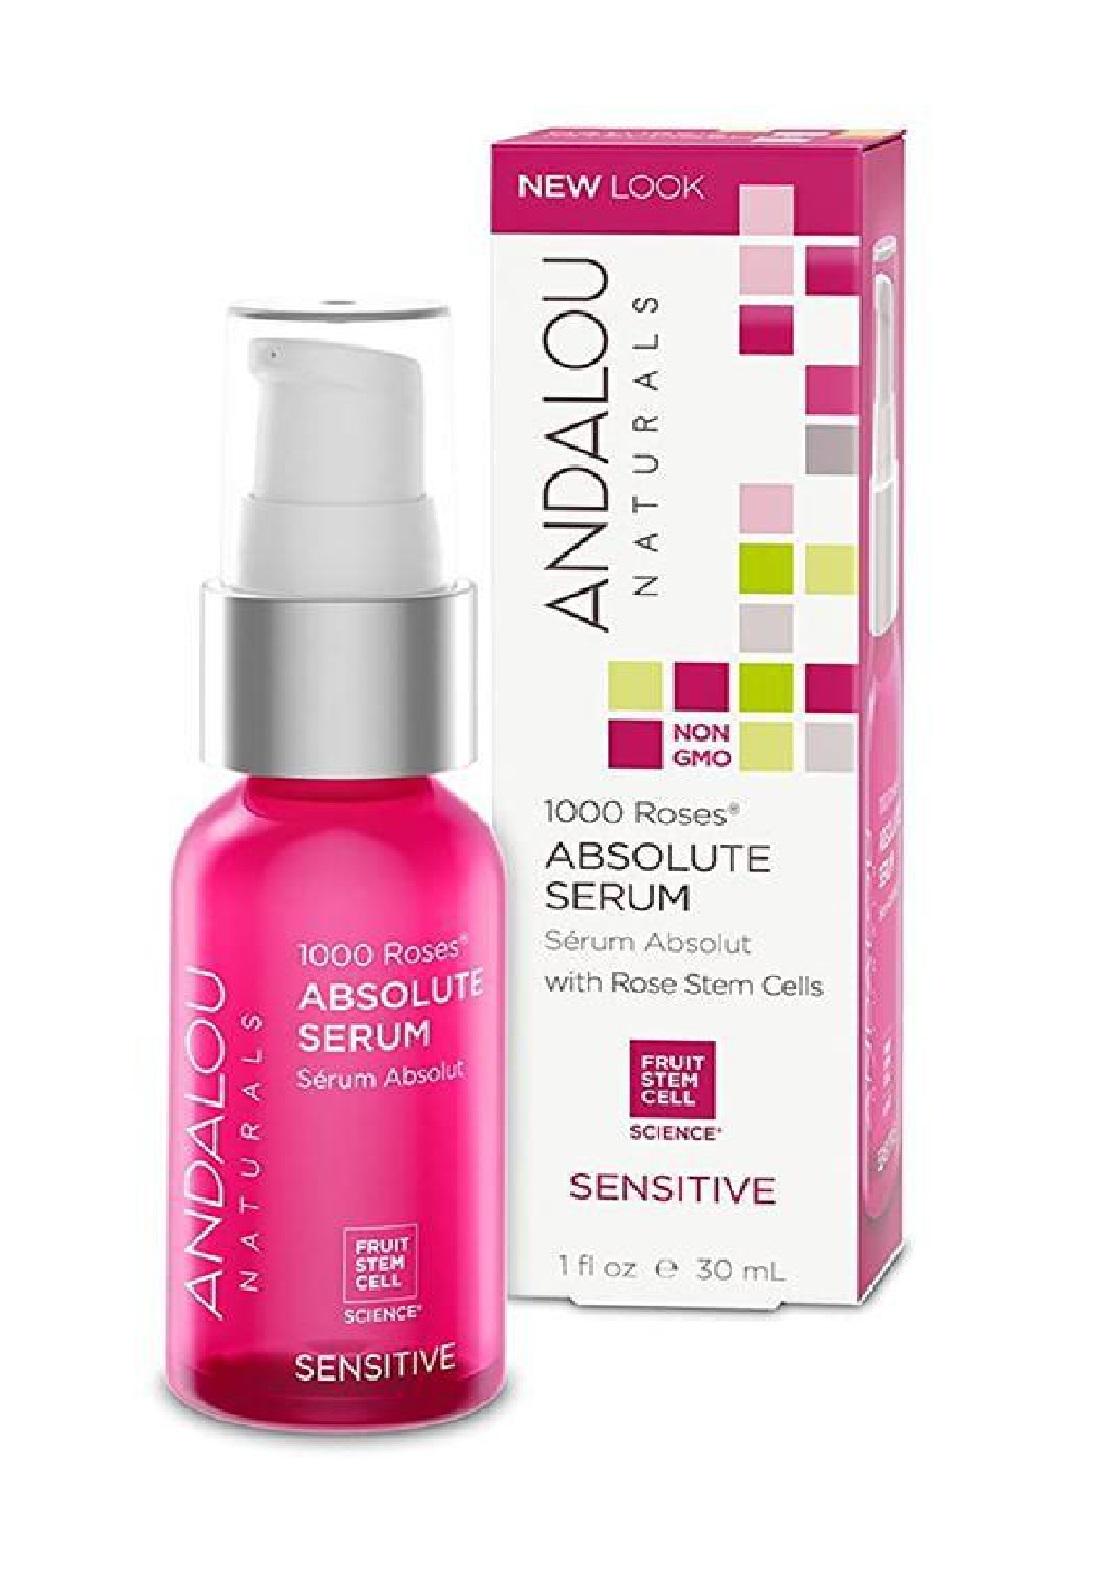 Andalou 0052 Naturals 1000 Roses Absolute Serum Sensitive سيروم للبشرة